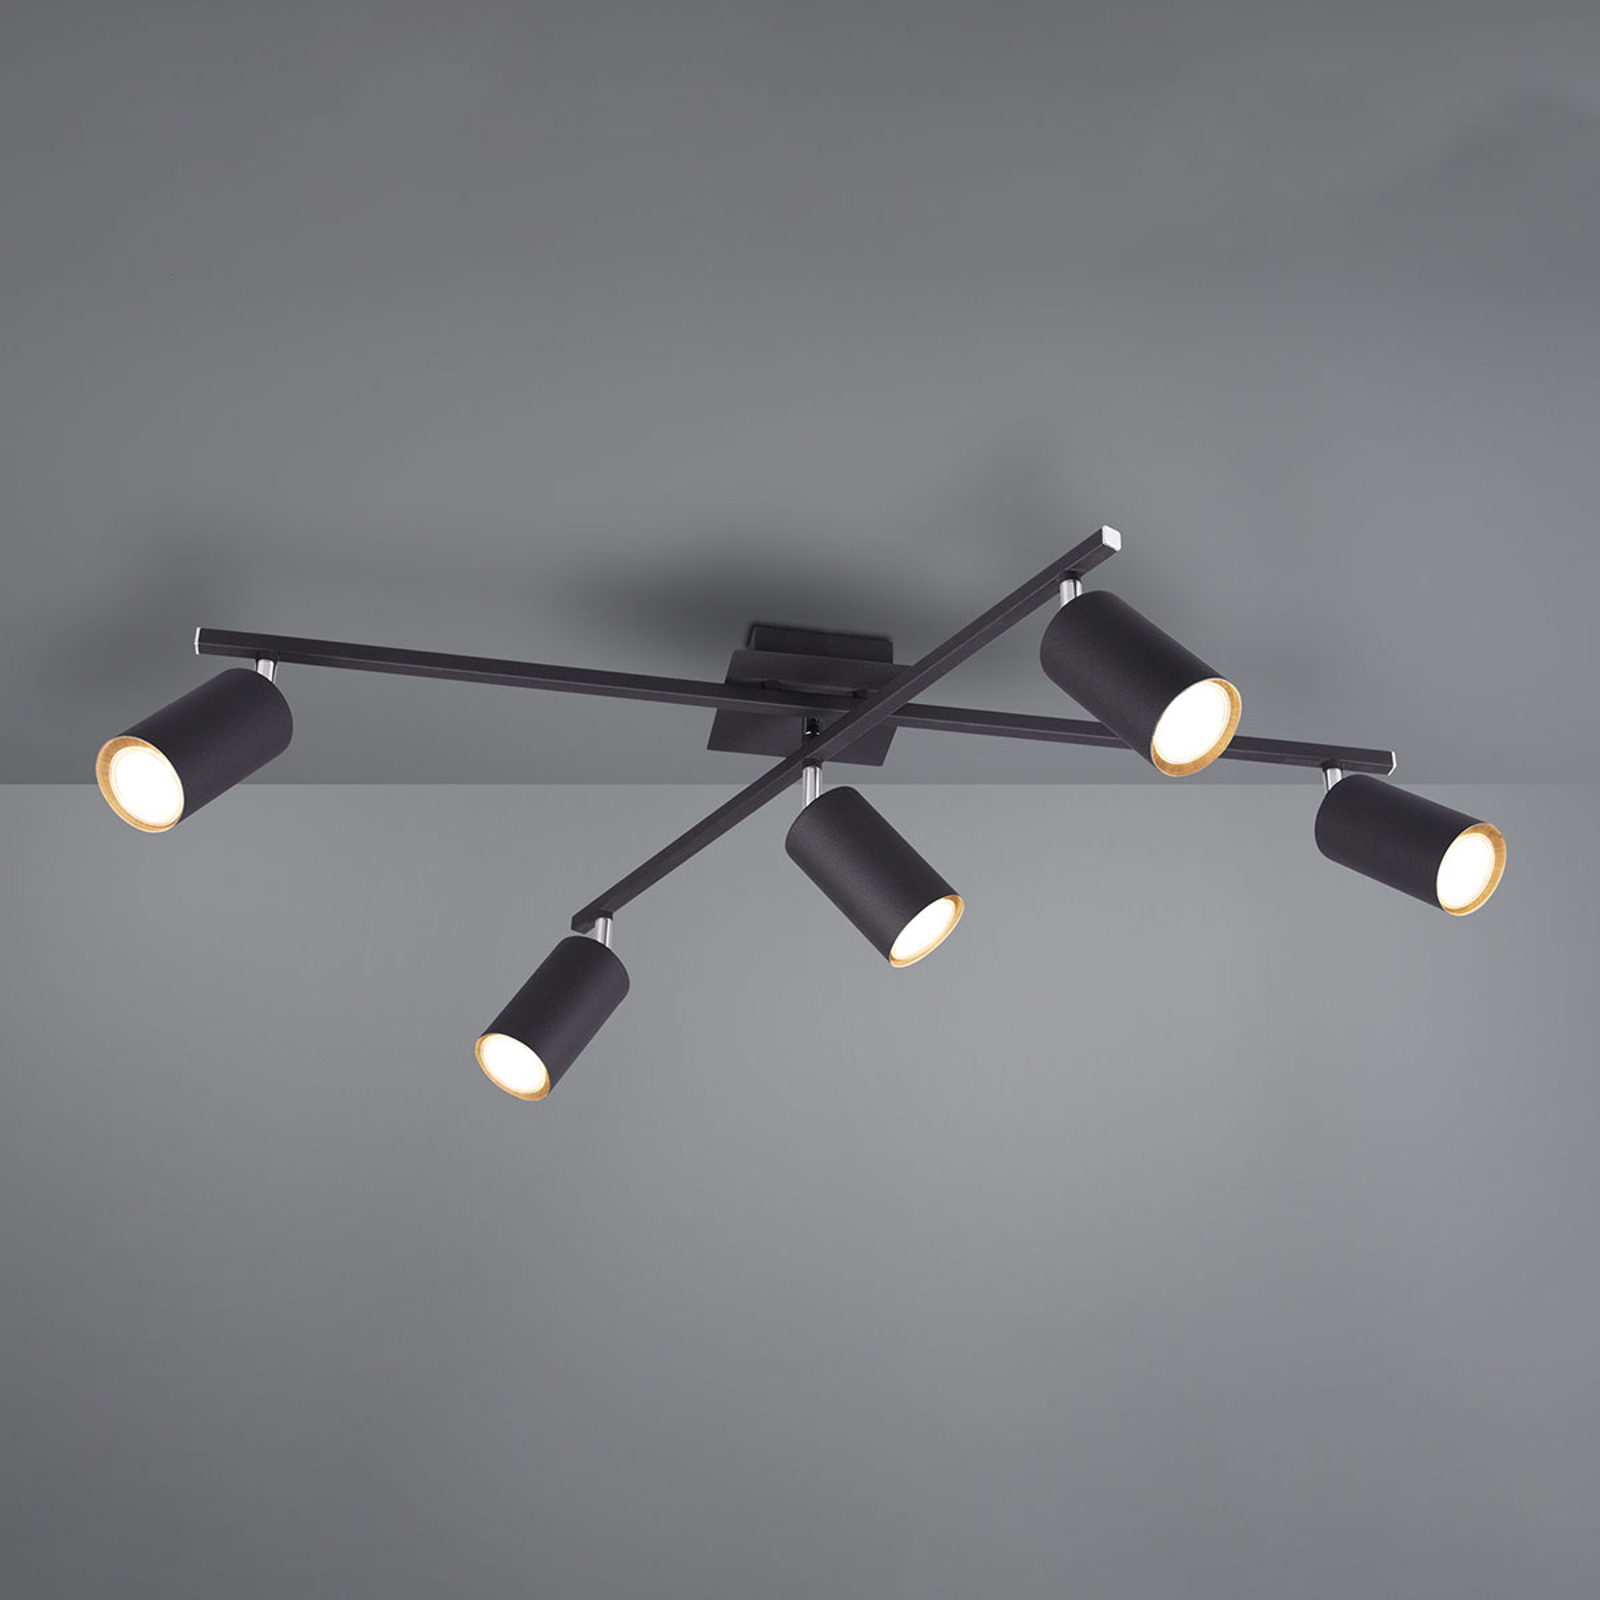 Lampa sufitowa Marley czarna 5-punktowa